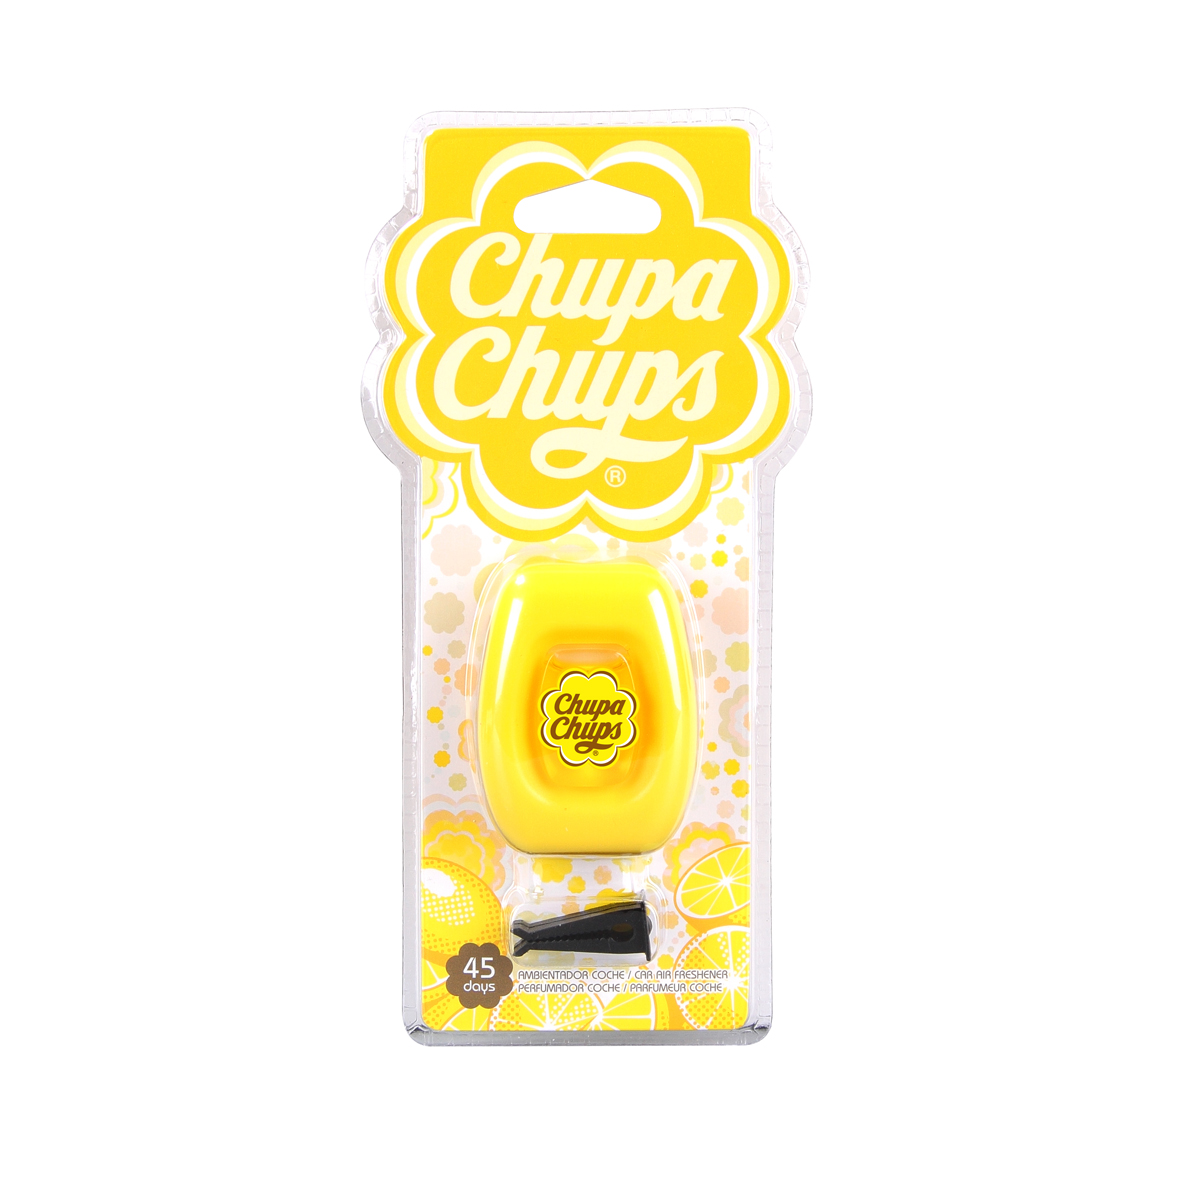 Chupa Chups น้ำหอมปรับอากาศช่องแอร์แบบเหลี่ยม กลิ่น Lime Lemon (มะนาว)